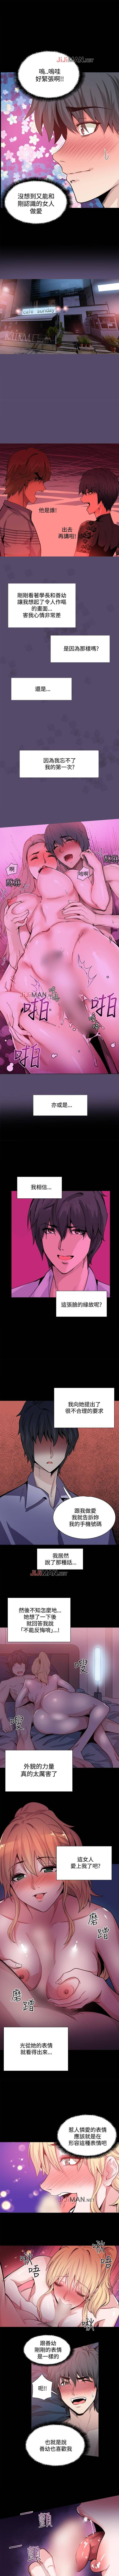 【已完结】Bodychange(作者:Seize & 死亡節奏) 第1~33话 65